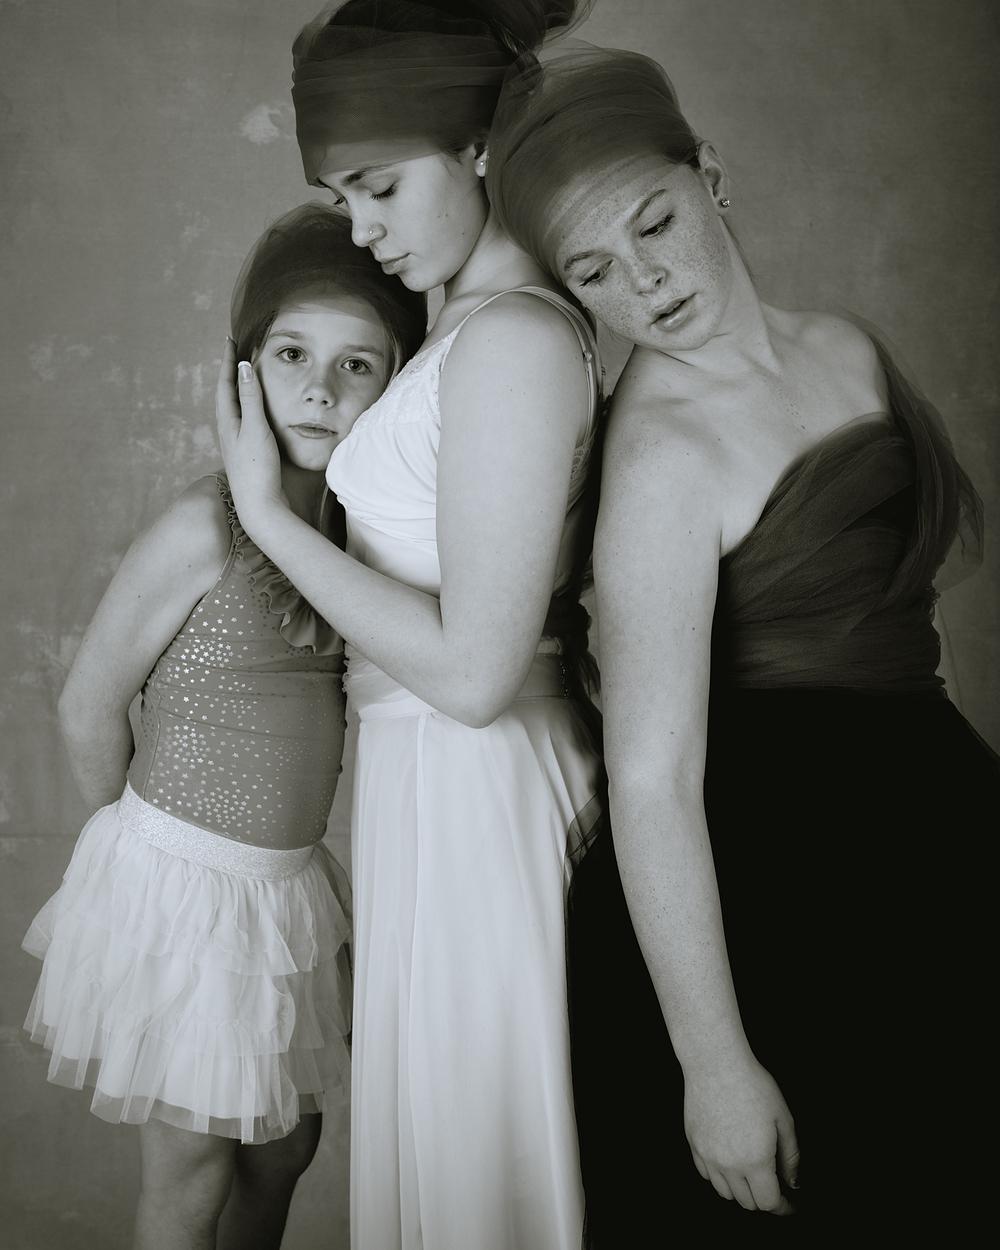 3 Sisters Portraits Wendy Holman 2015-12427 16x20 WEB.jpg